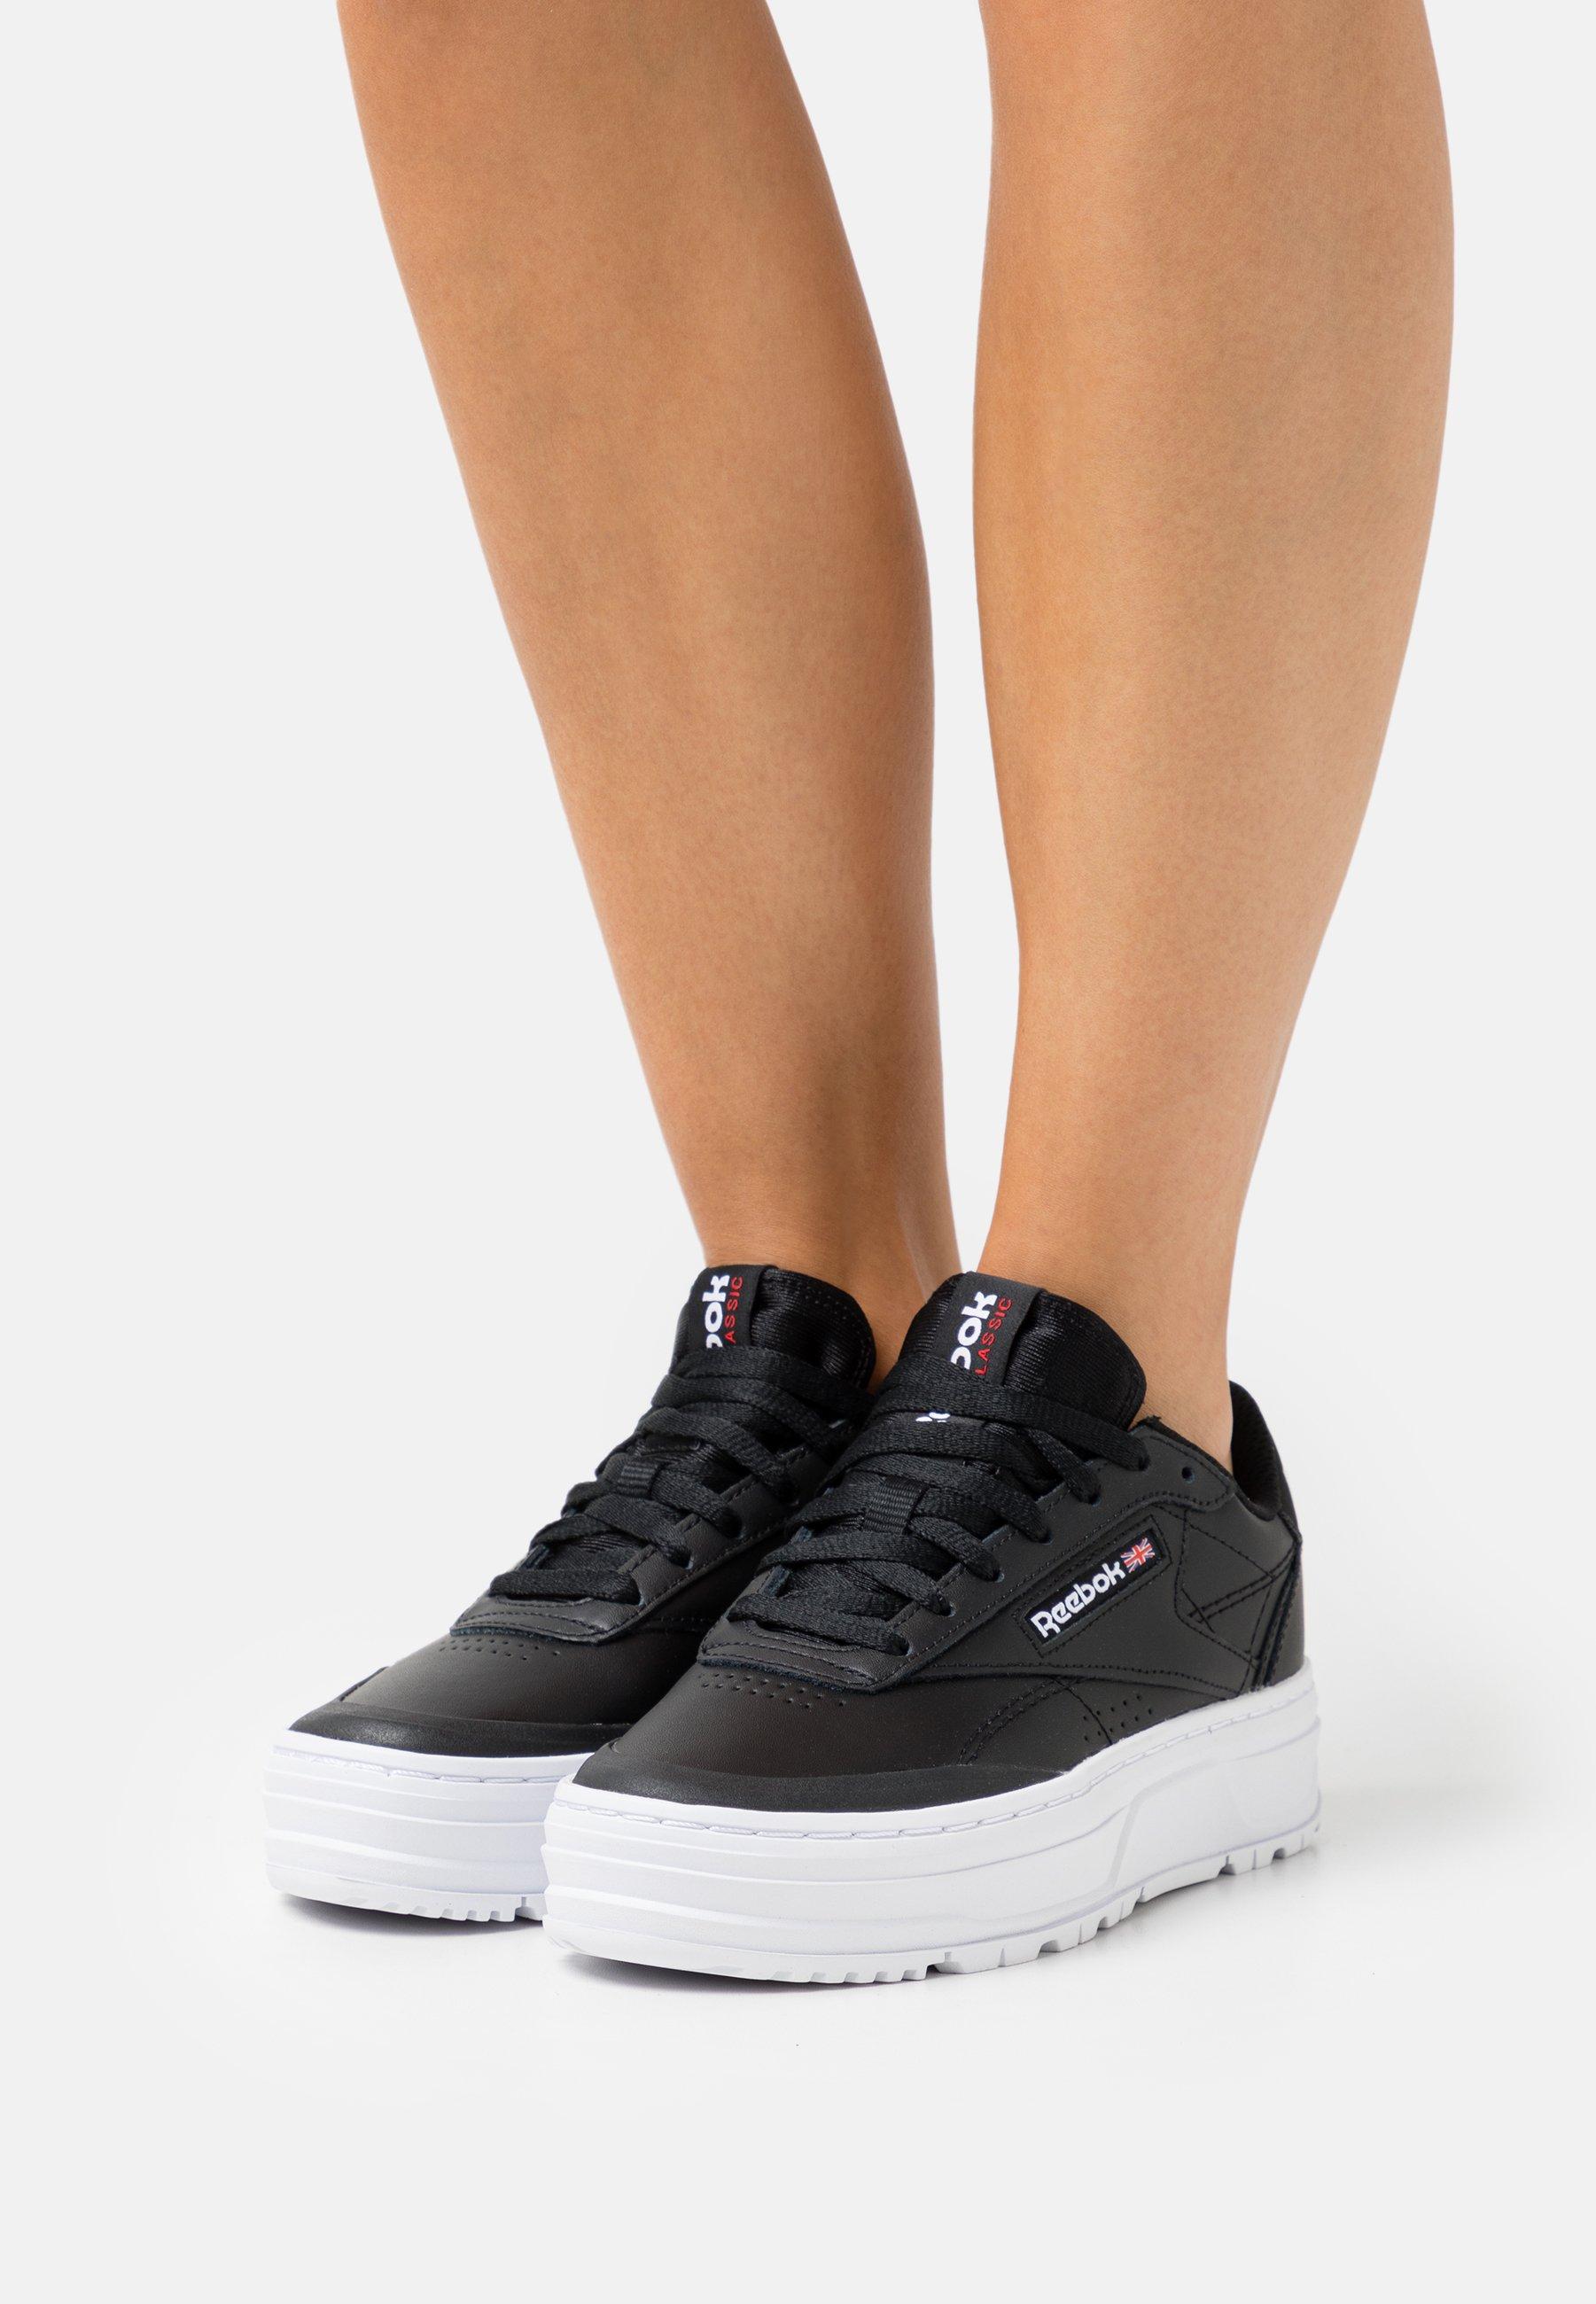 Femme CLUB C DOUBLE GEO - Baskets basses - core black/footwear white/pure grey